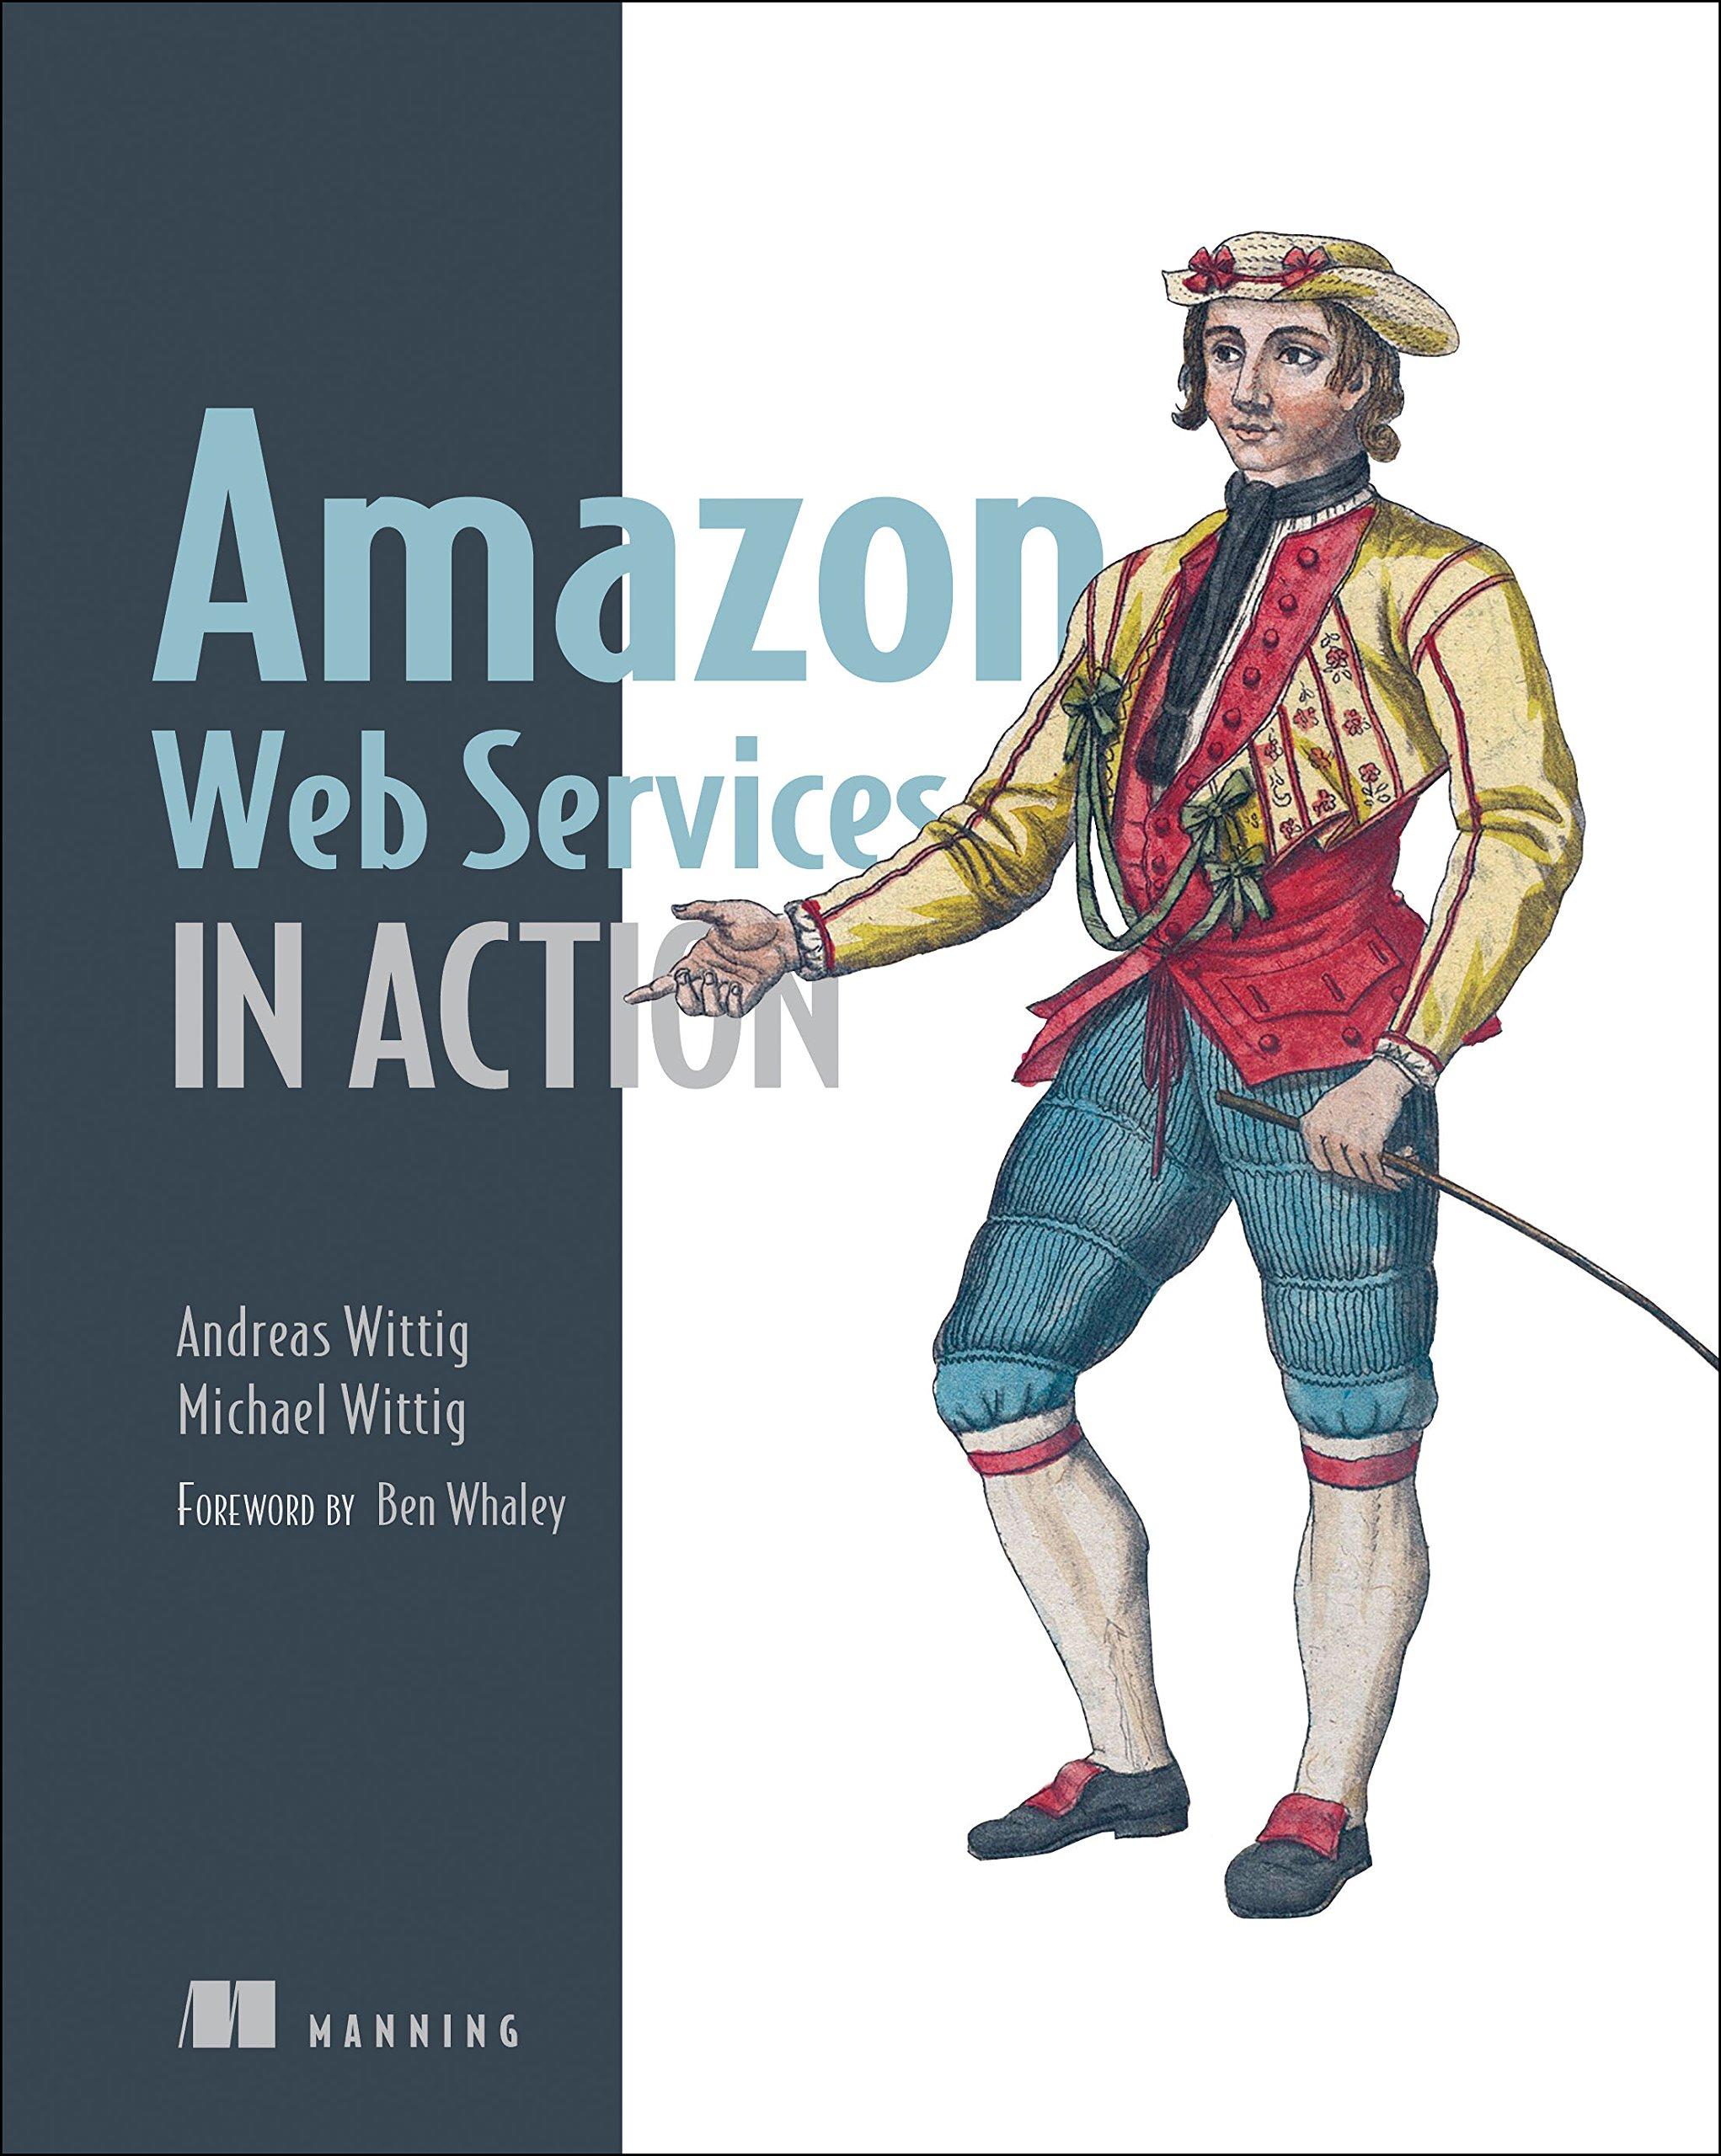 WEB SERVICES BOOKS EBOOK DOWNLOAD